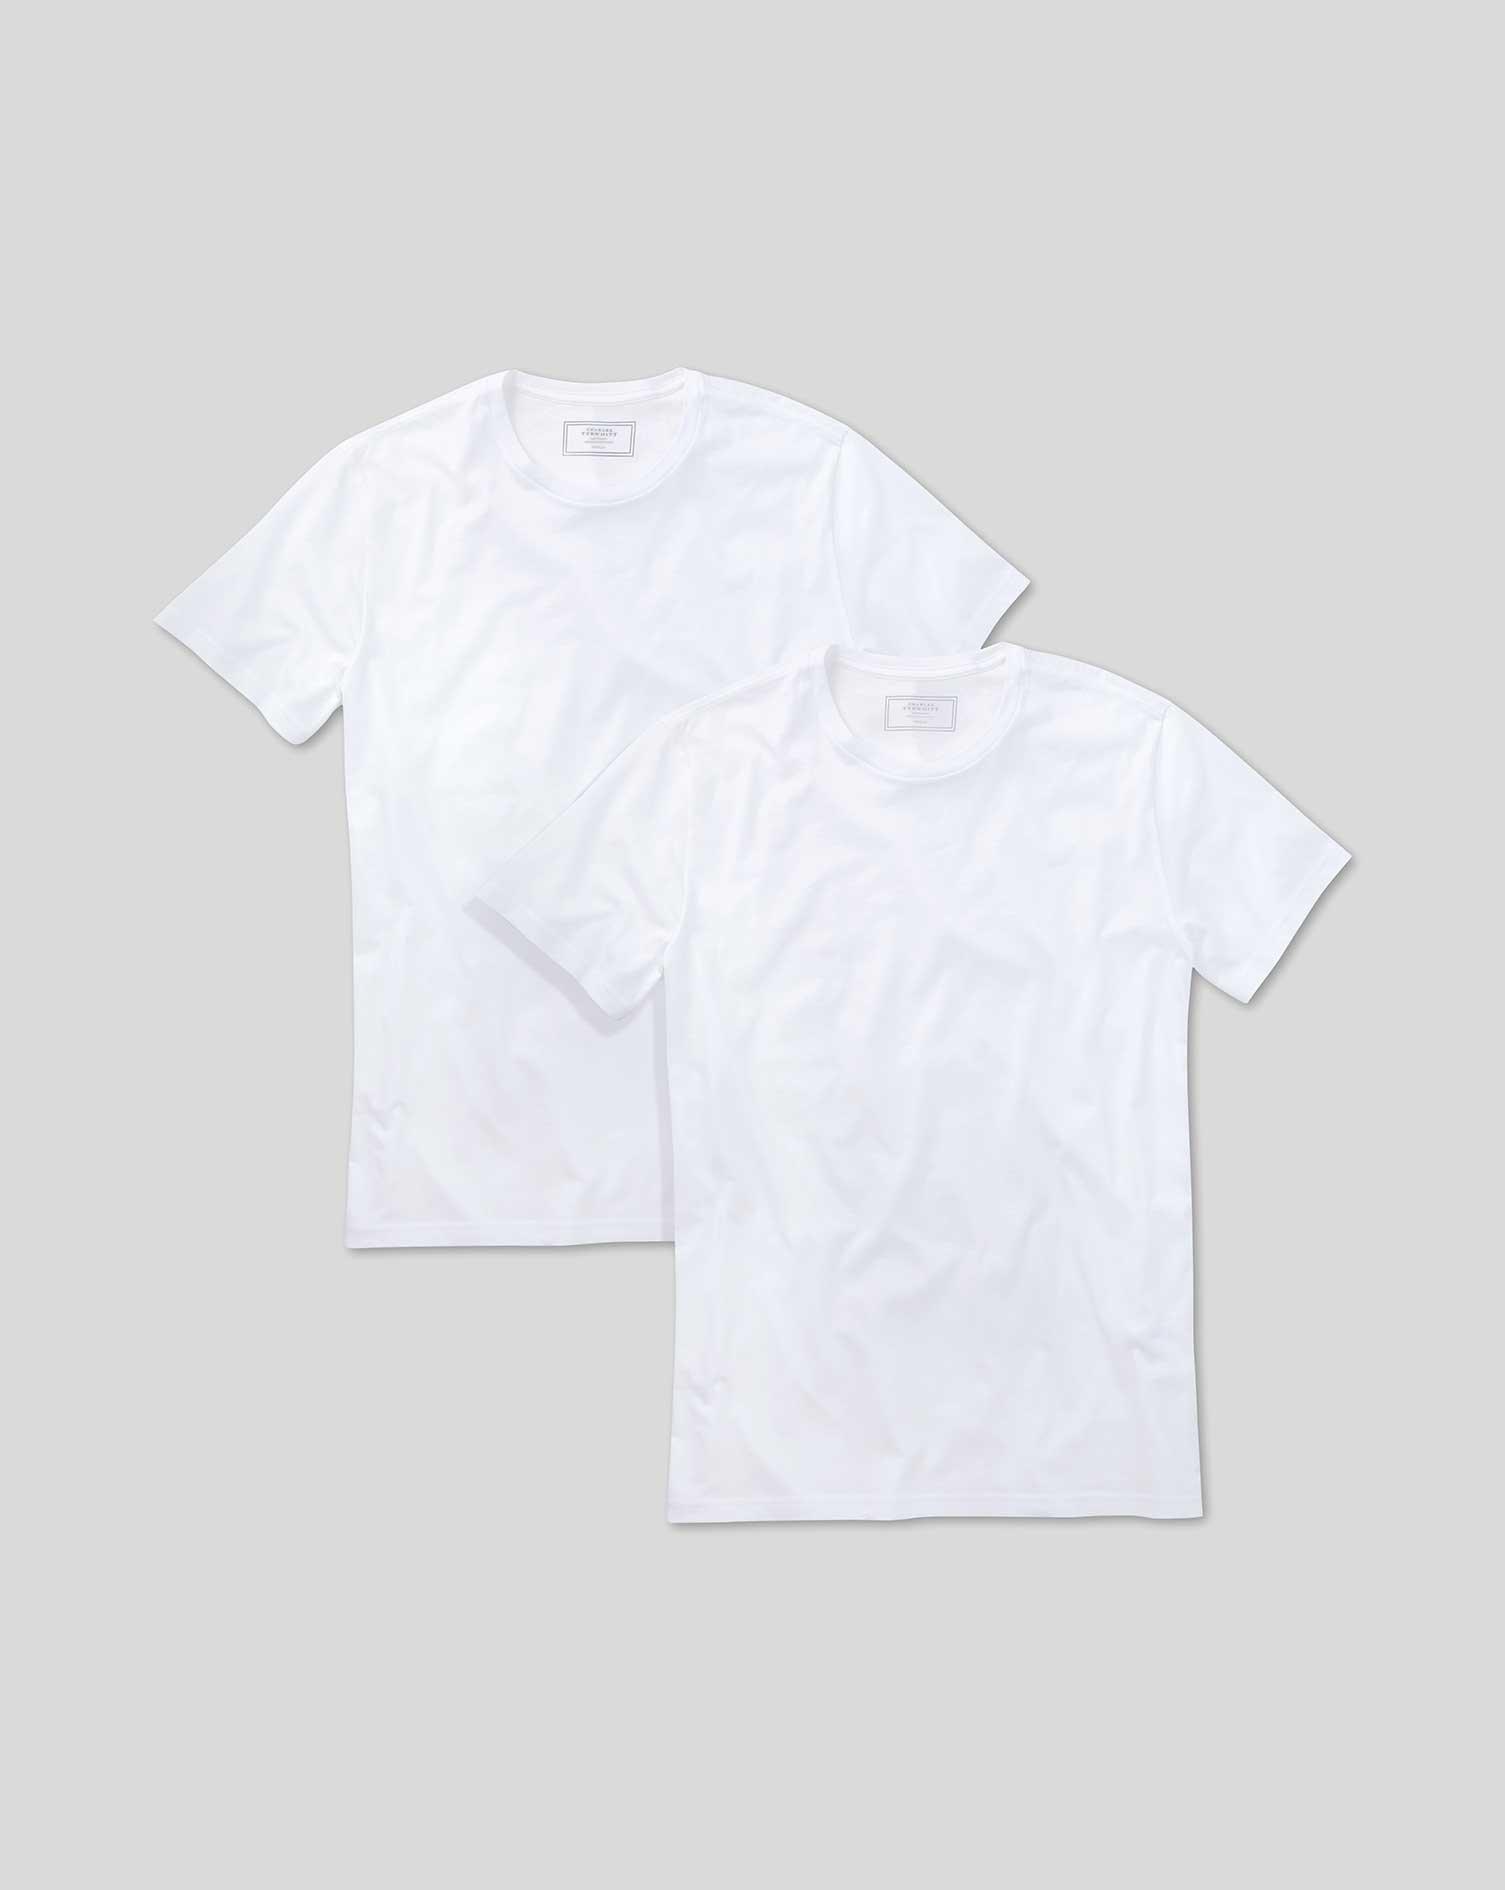 Image of Charles Tyrwhitt 2 Pack White Cotton Undershirt T-Shirts Size Large by Charles Tyrwhitt